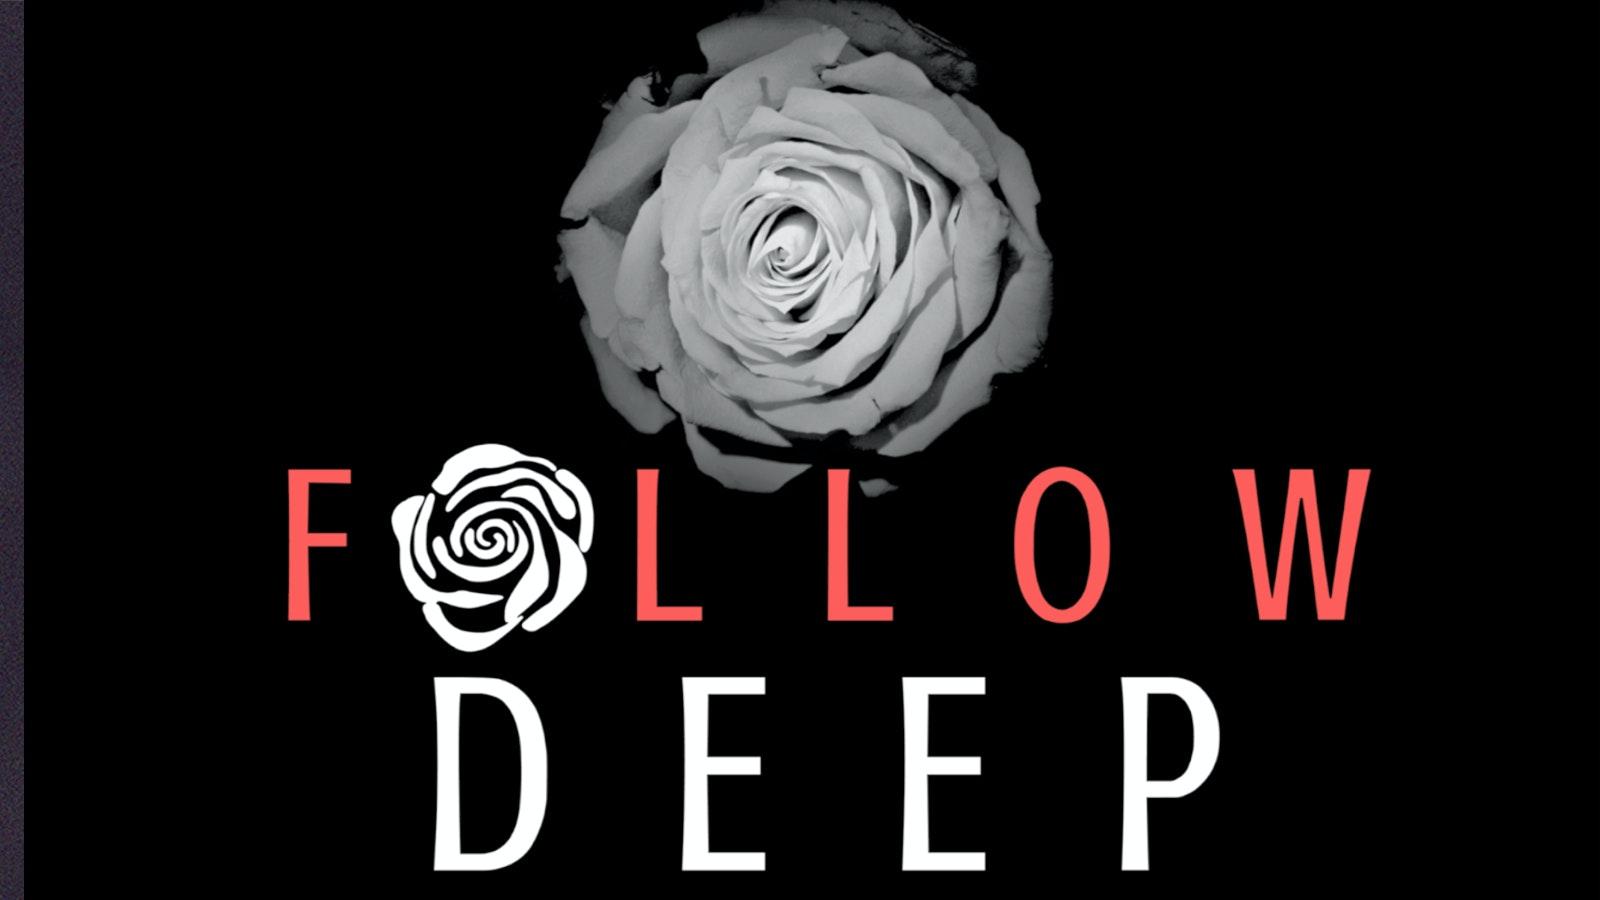 Follow Deep + Klae + Pickpockets